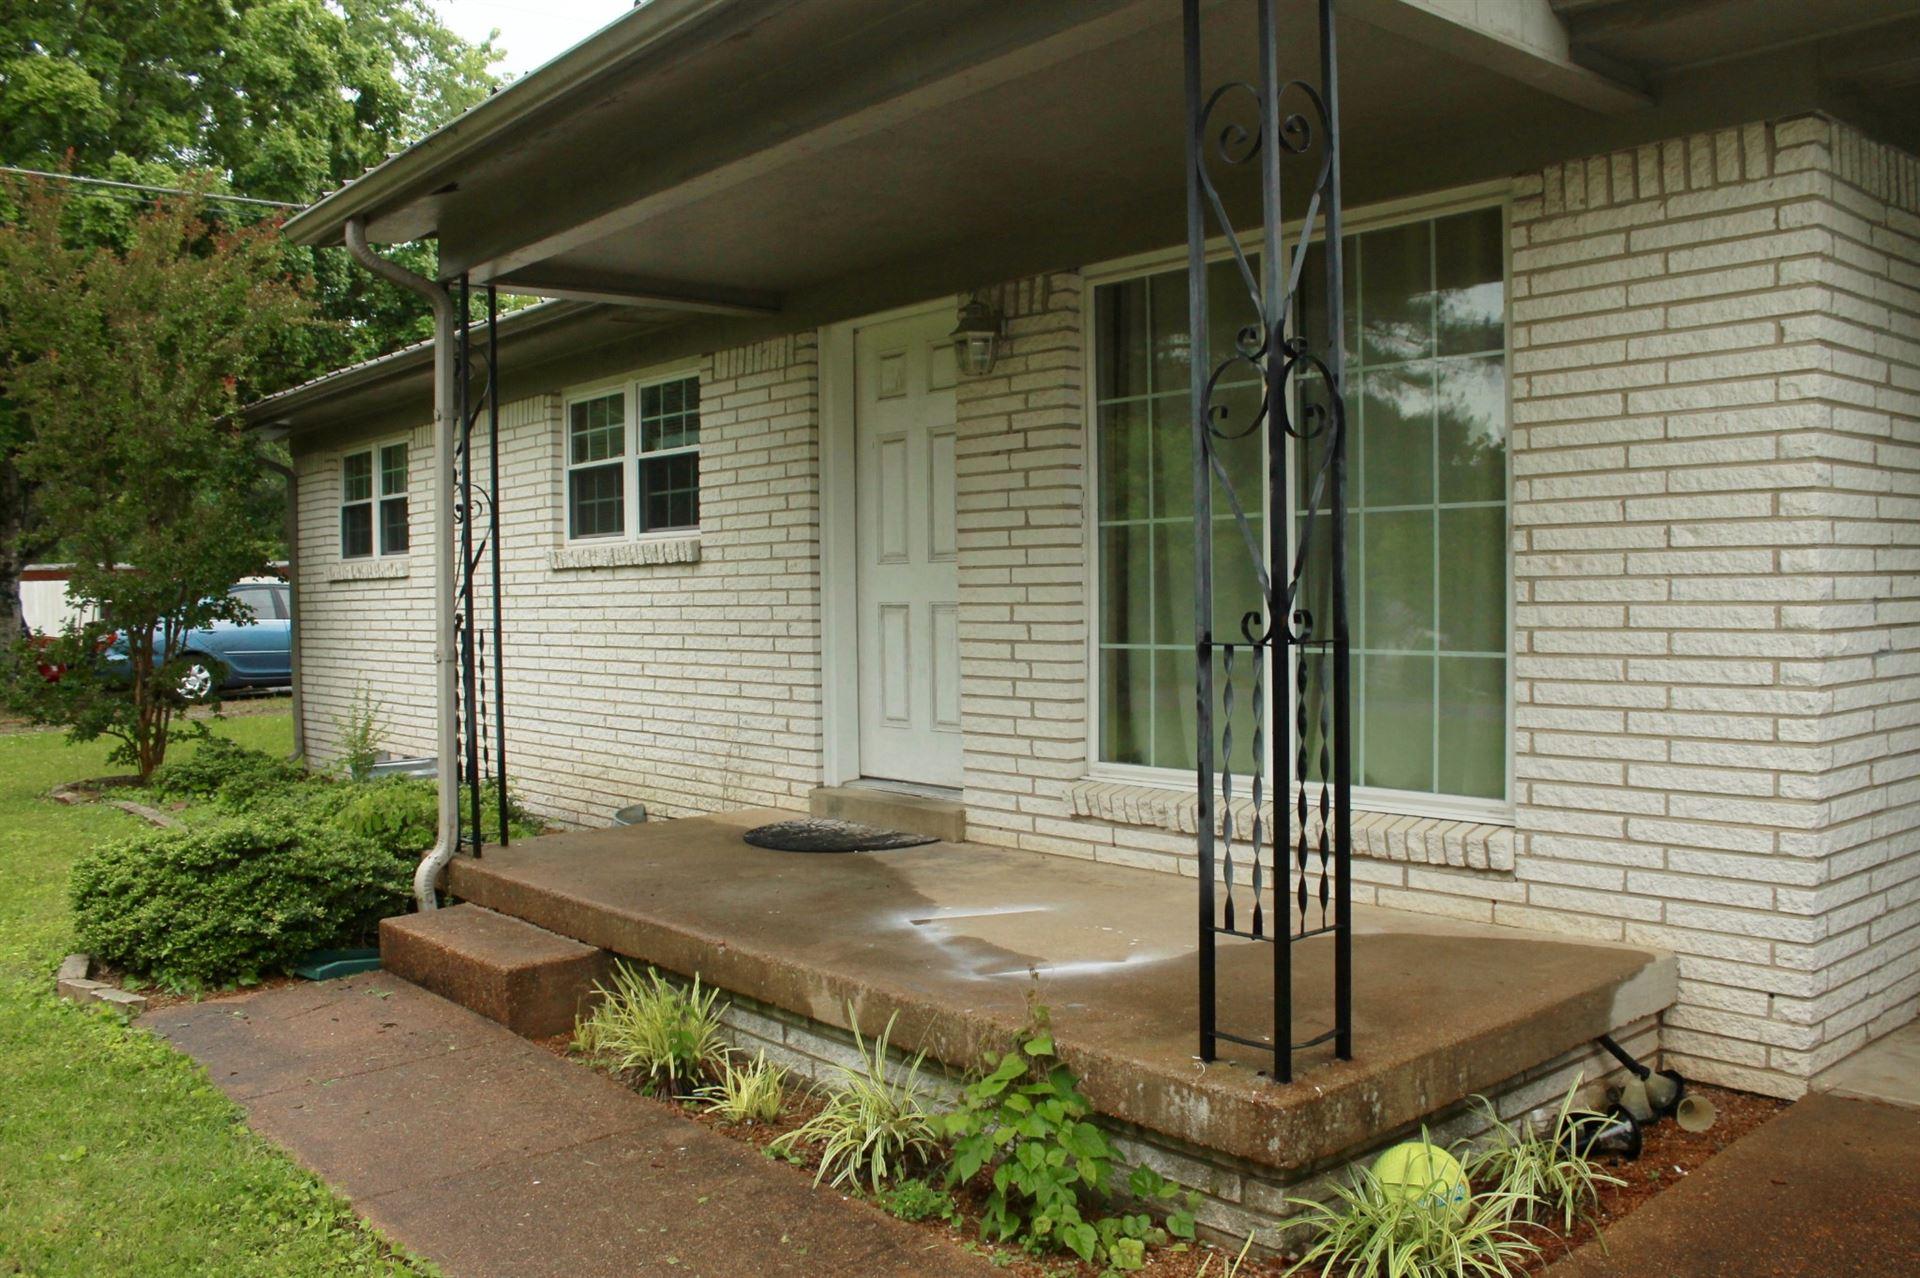 507 Collins St, Hohenwald, TN 38462 - MLS#: 2261246